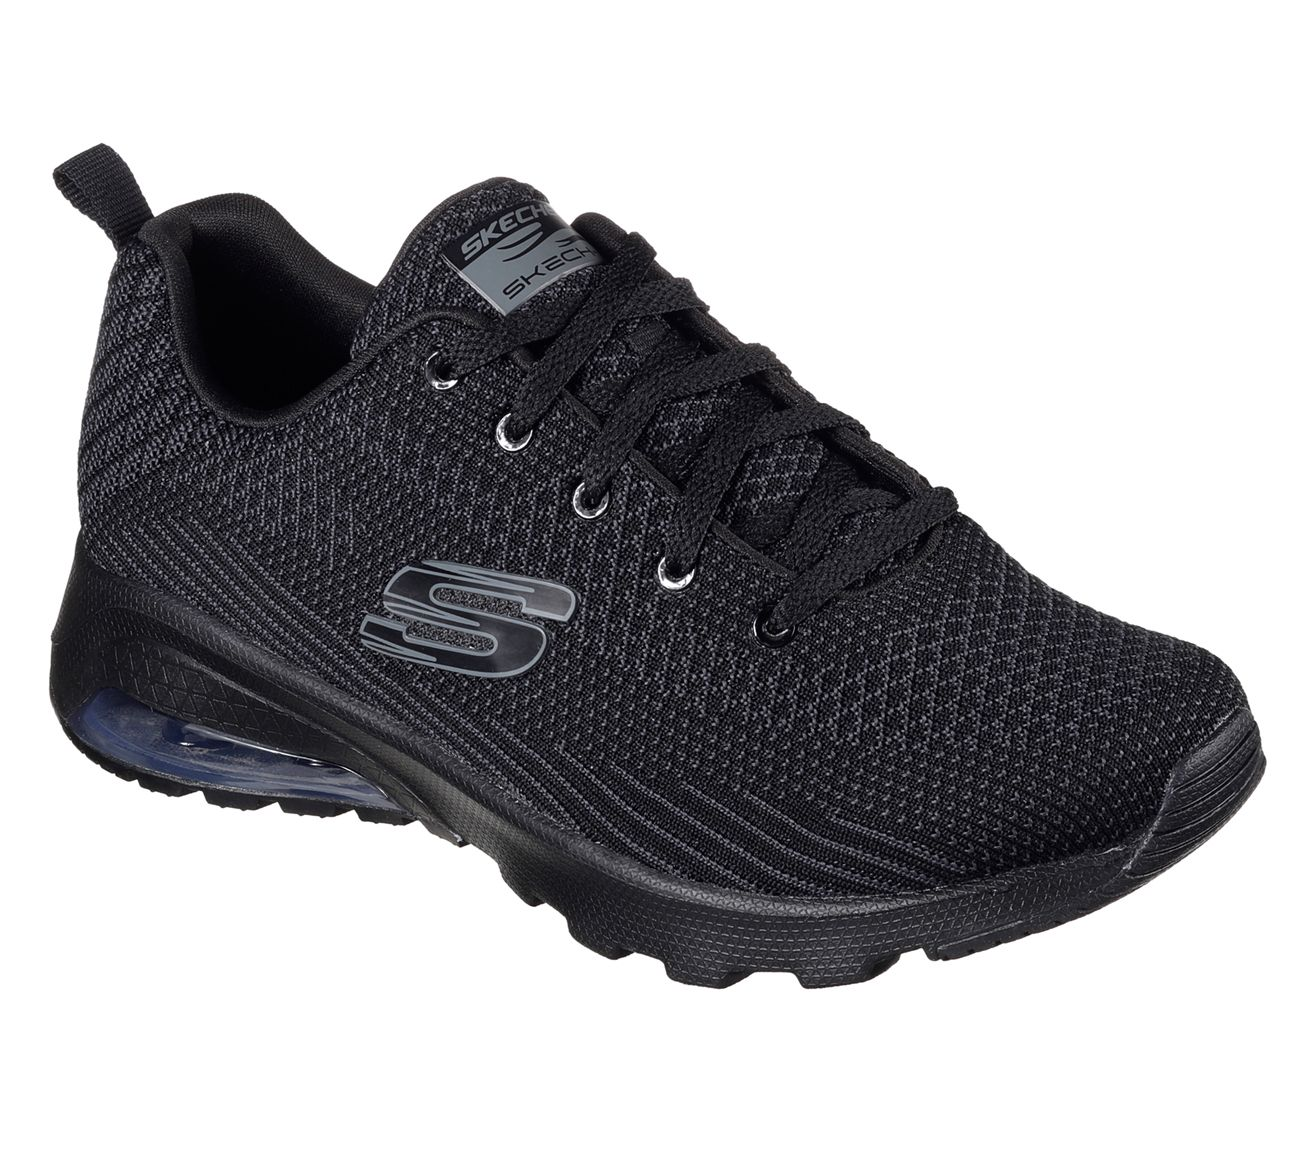 Skech Air Extreme Awaken Training Shoes Skechers Cushioned Heels